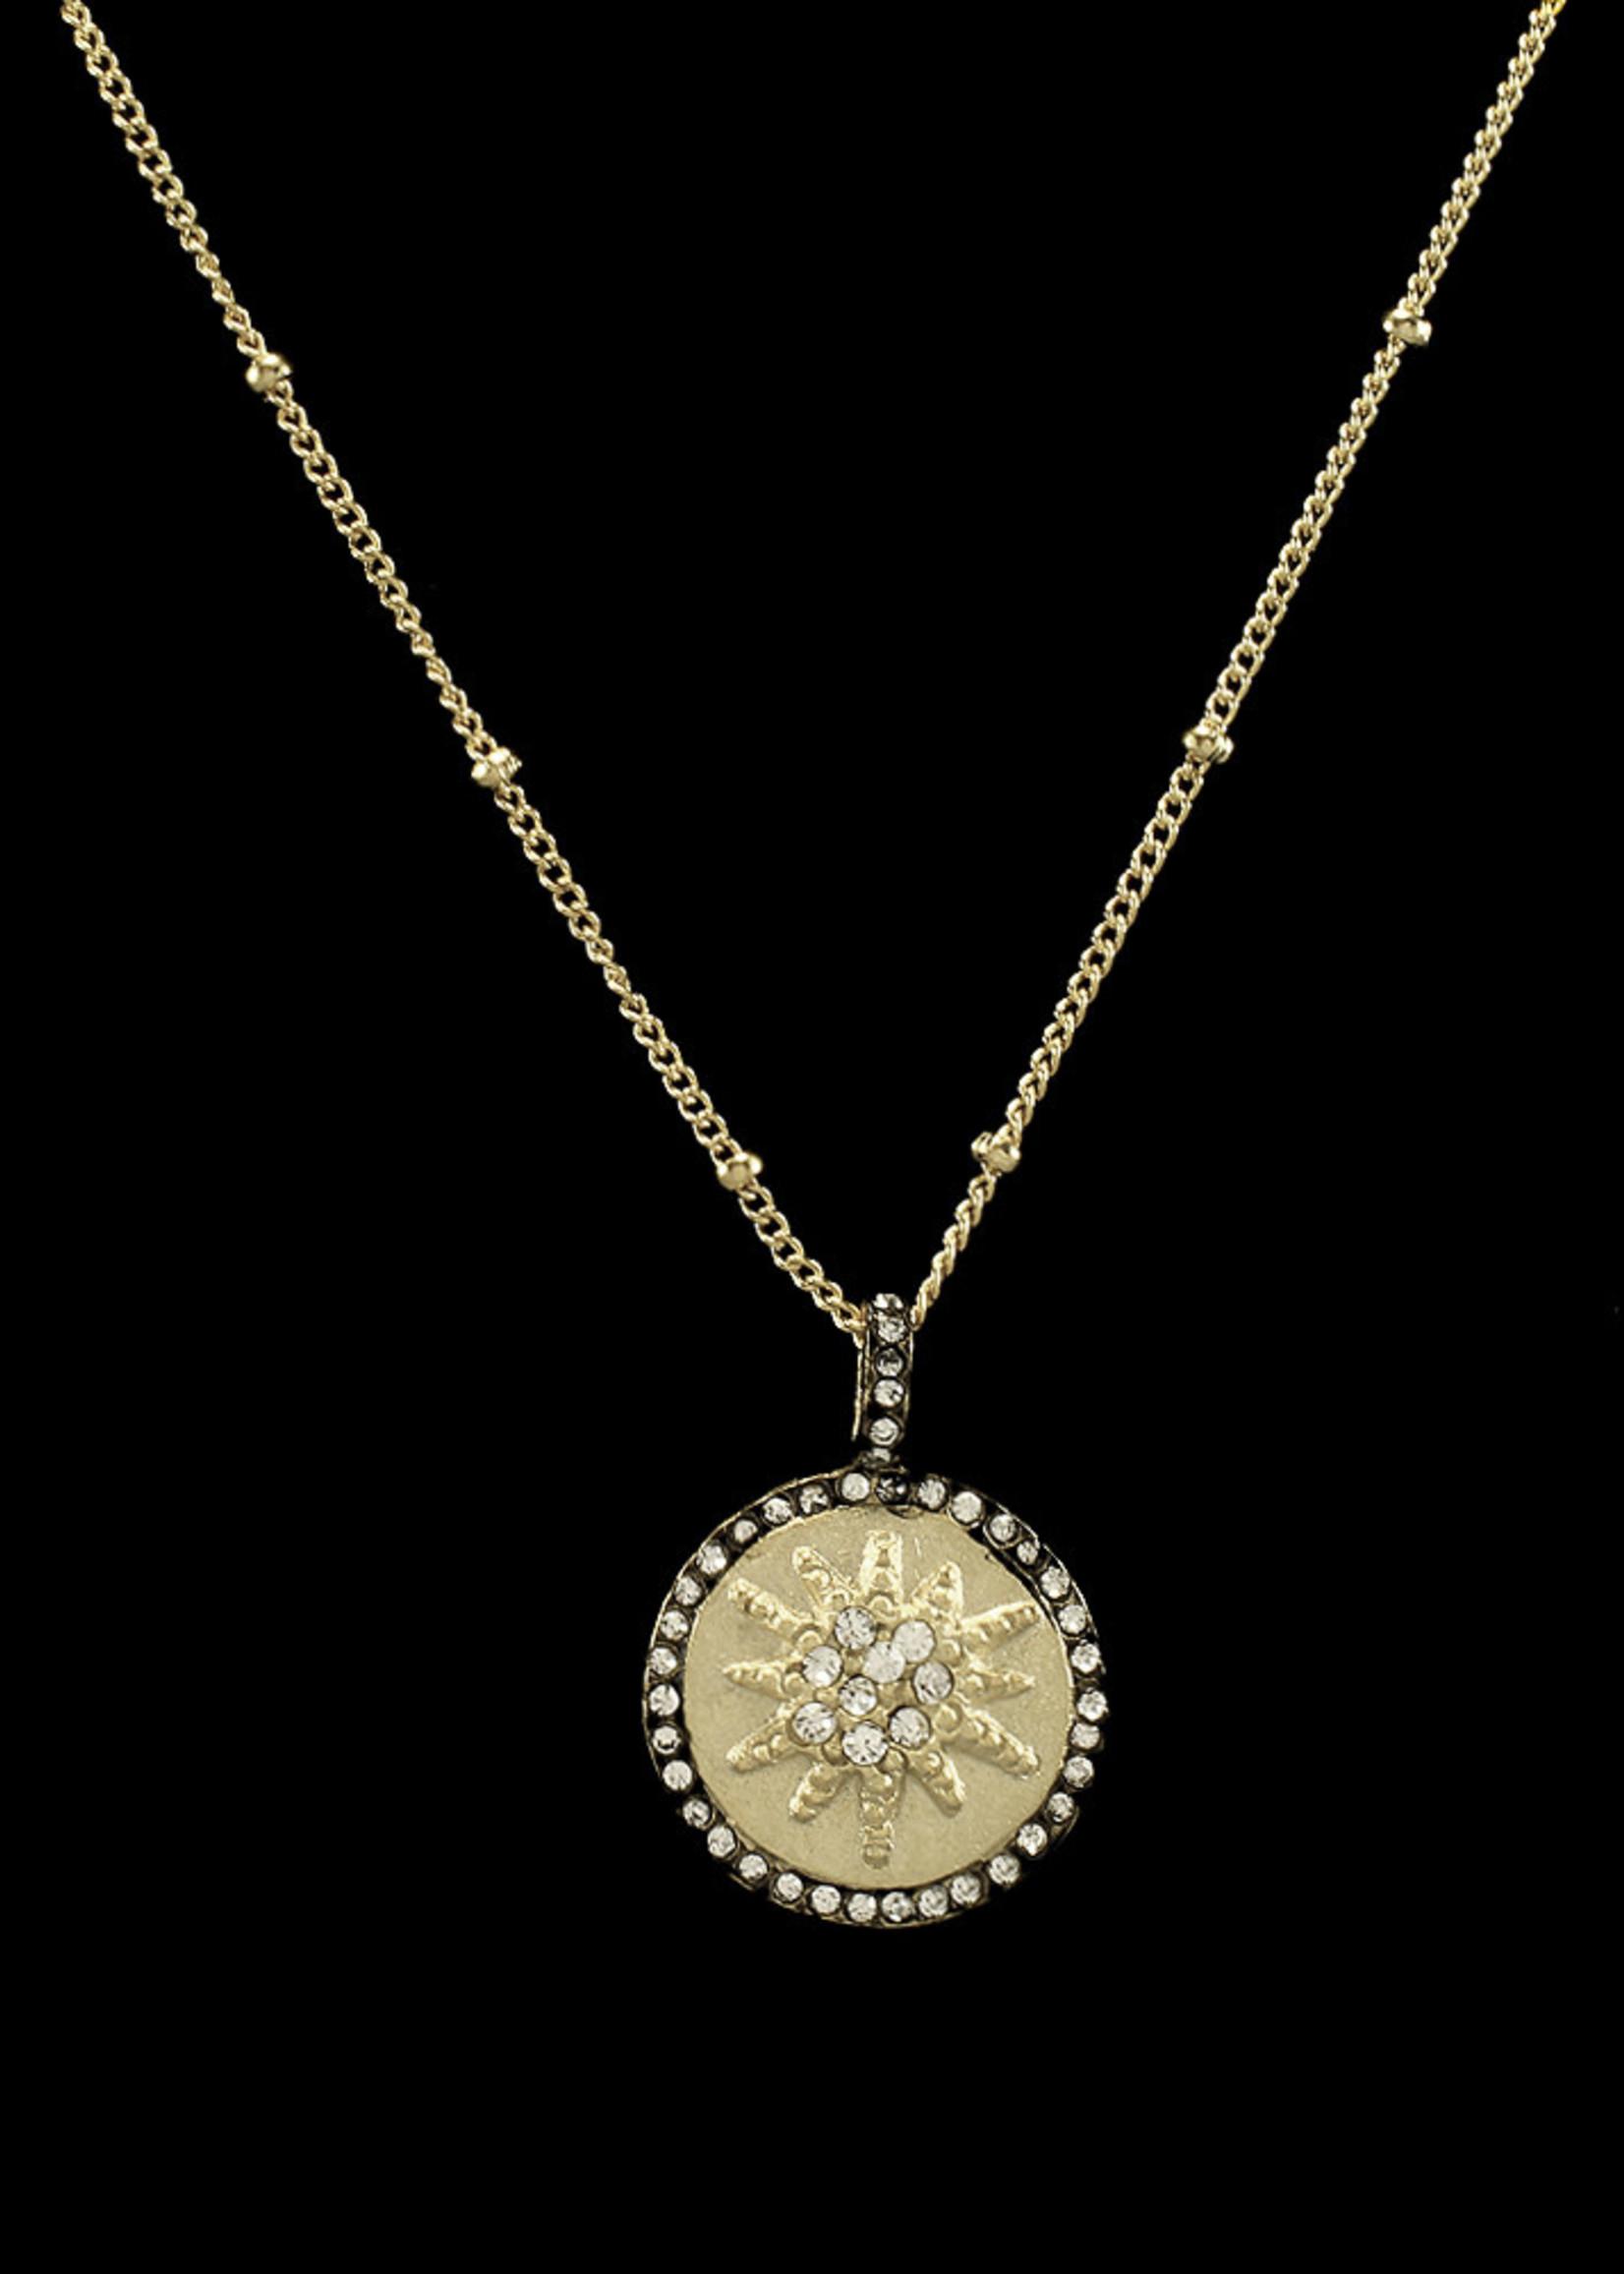 Be-Je Designs Beje - Gold Disc Necklace w/Starburst (MC3270N)